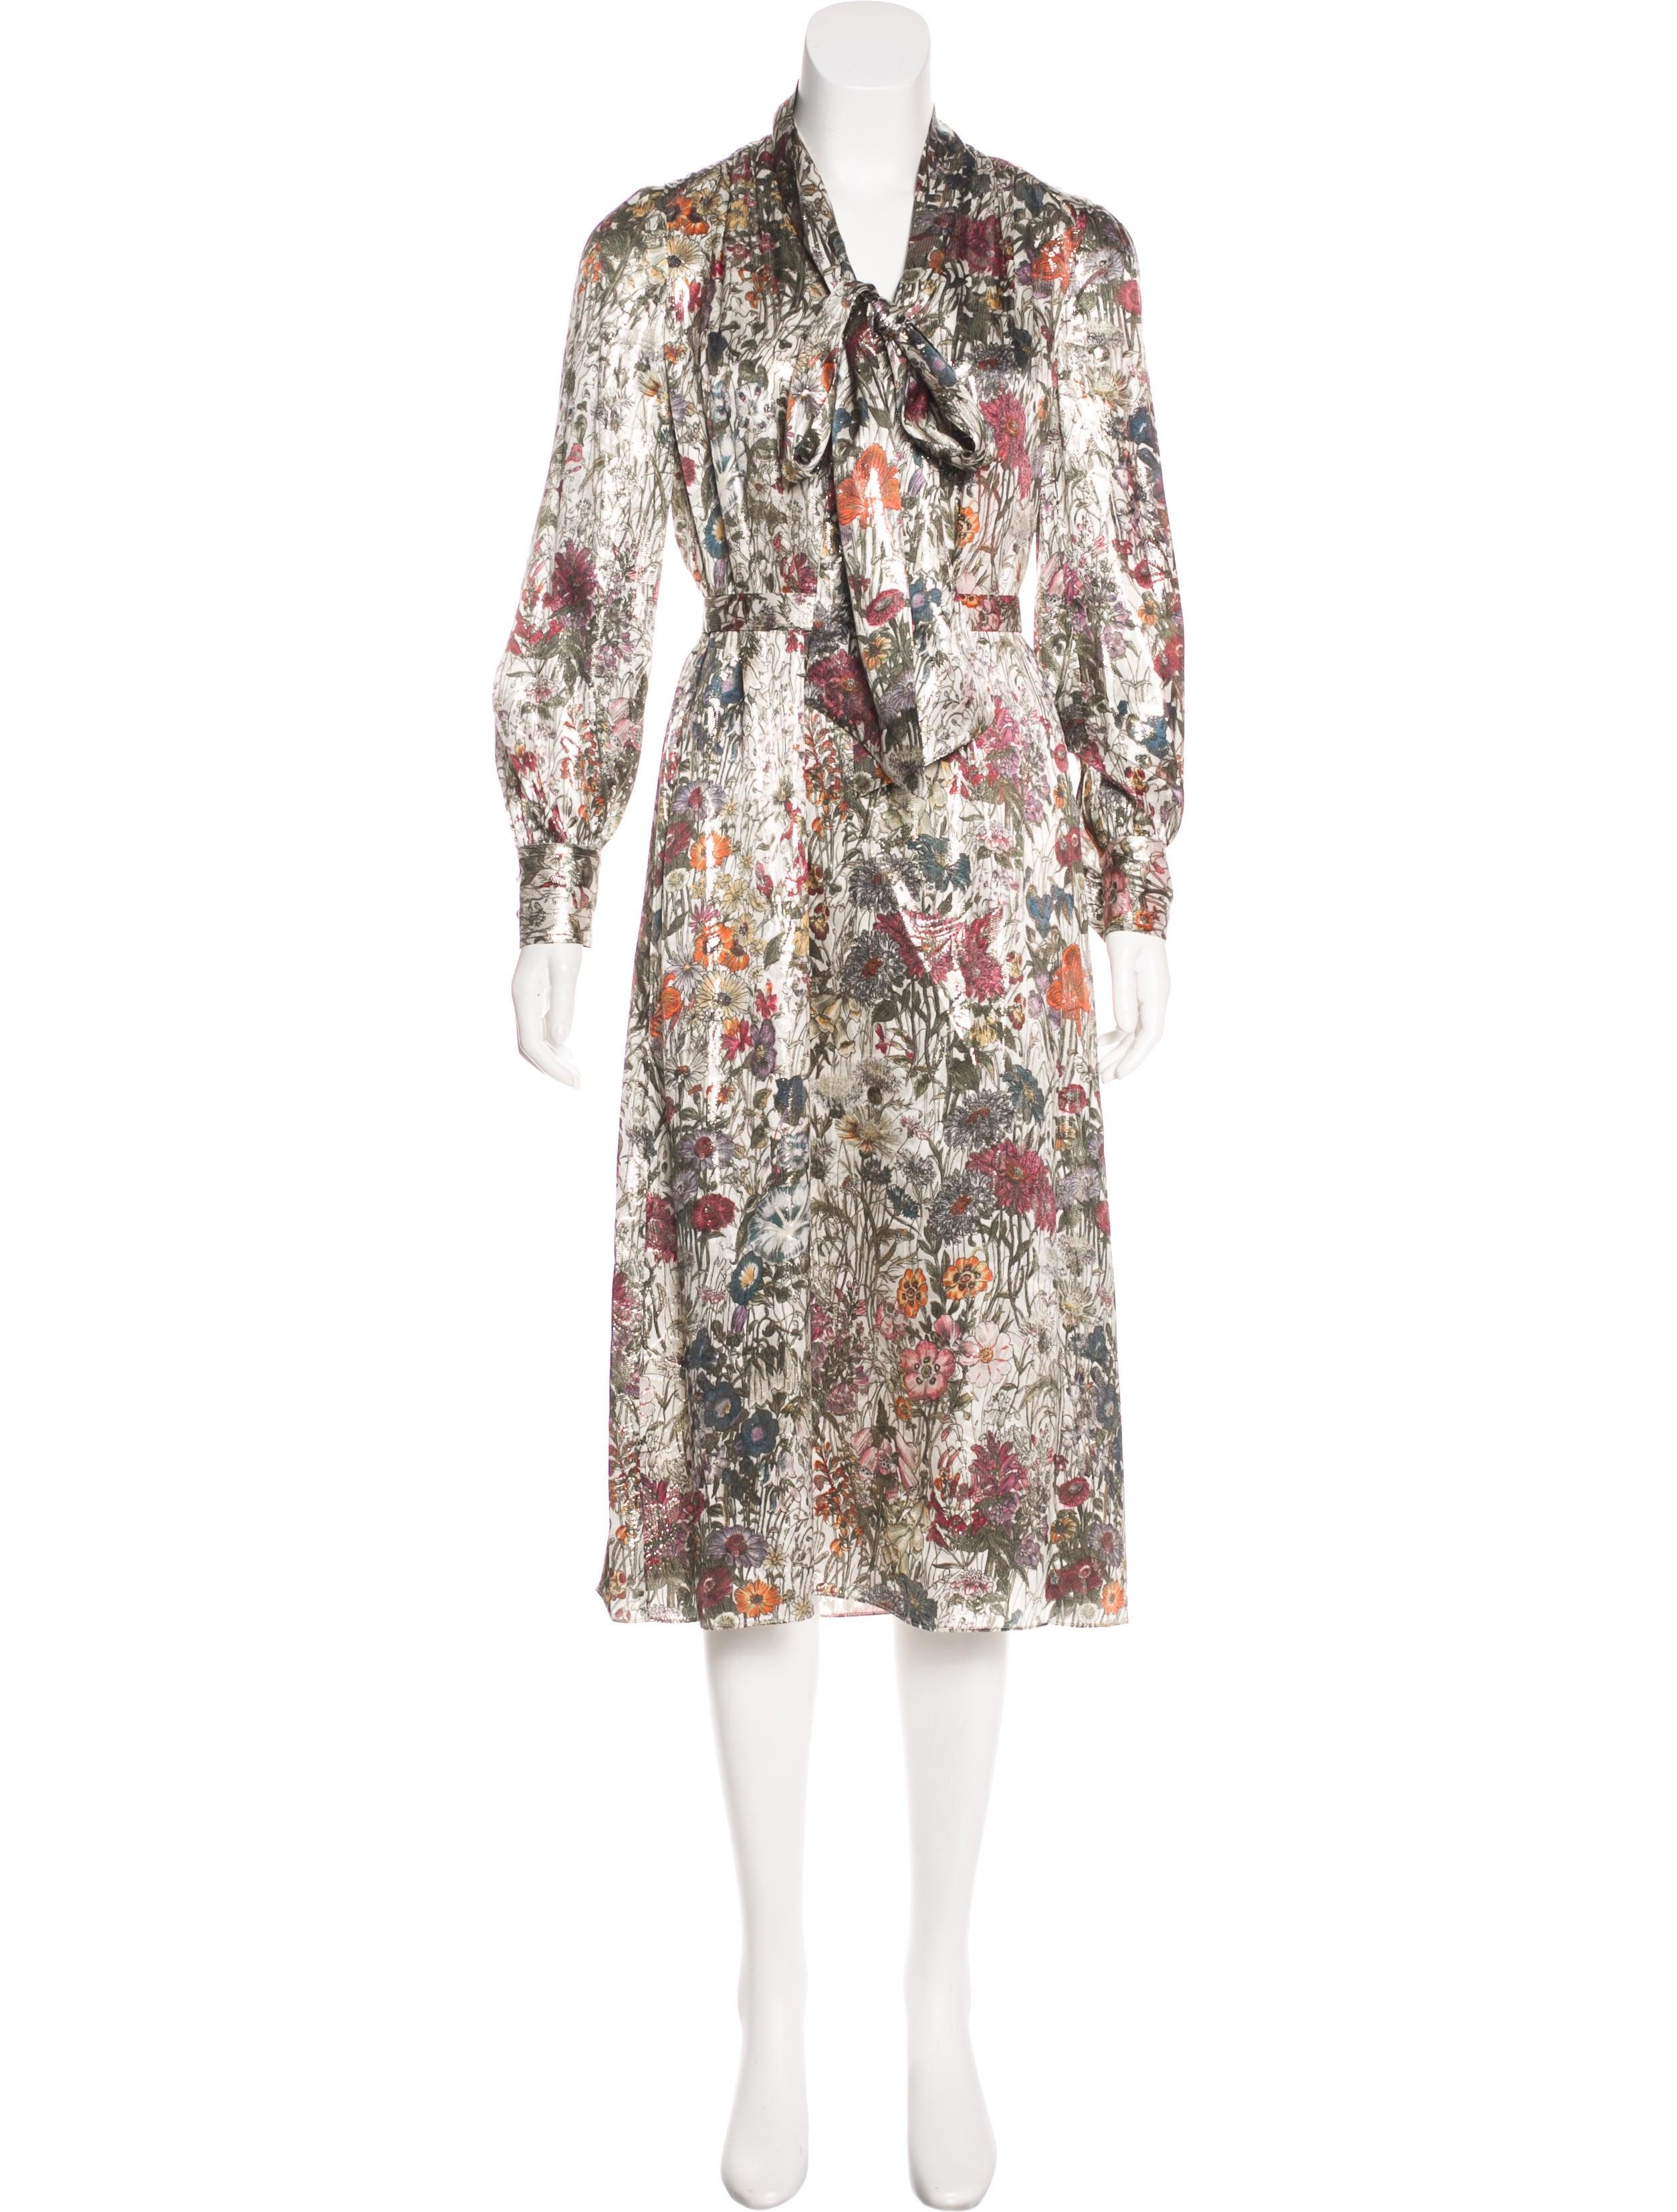 1617567e514 Tory Burch Vanessa Long Sleeve Dress w  Tags - Clothing - WTO117171 ...